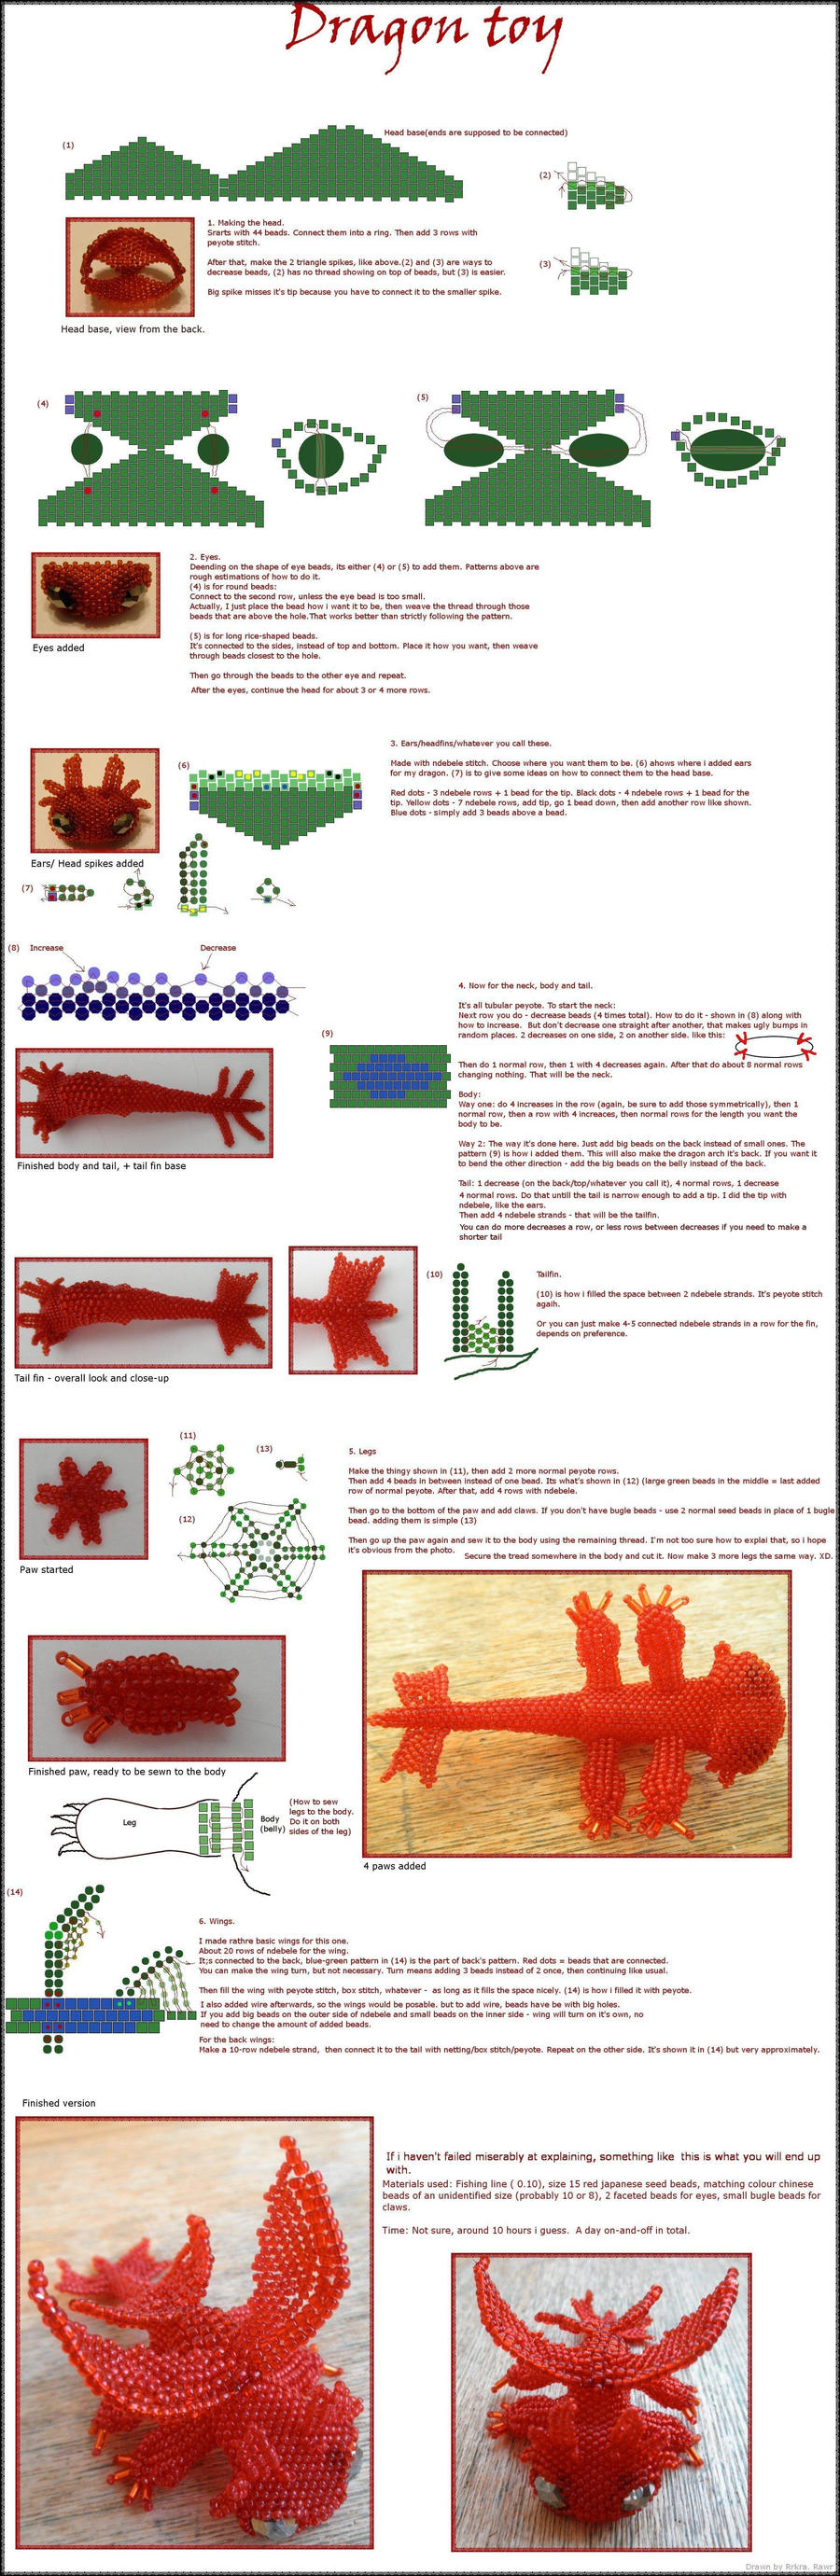 Dragon toy tutorial by Rrkra